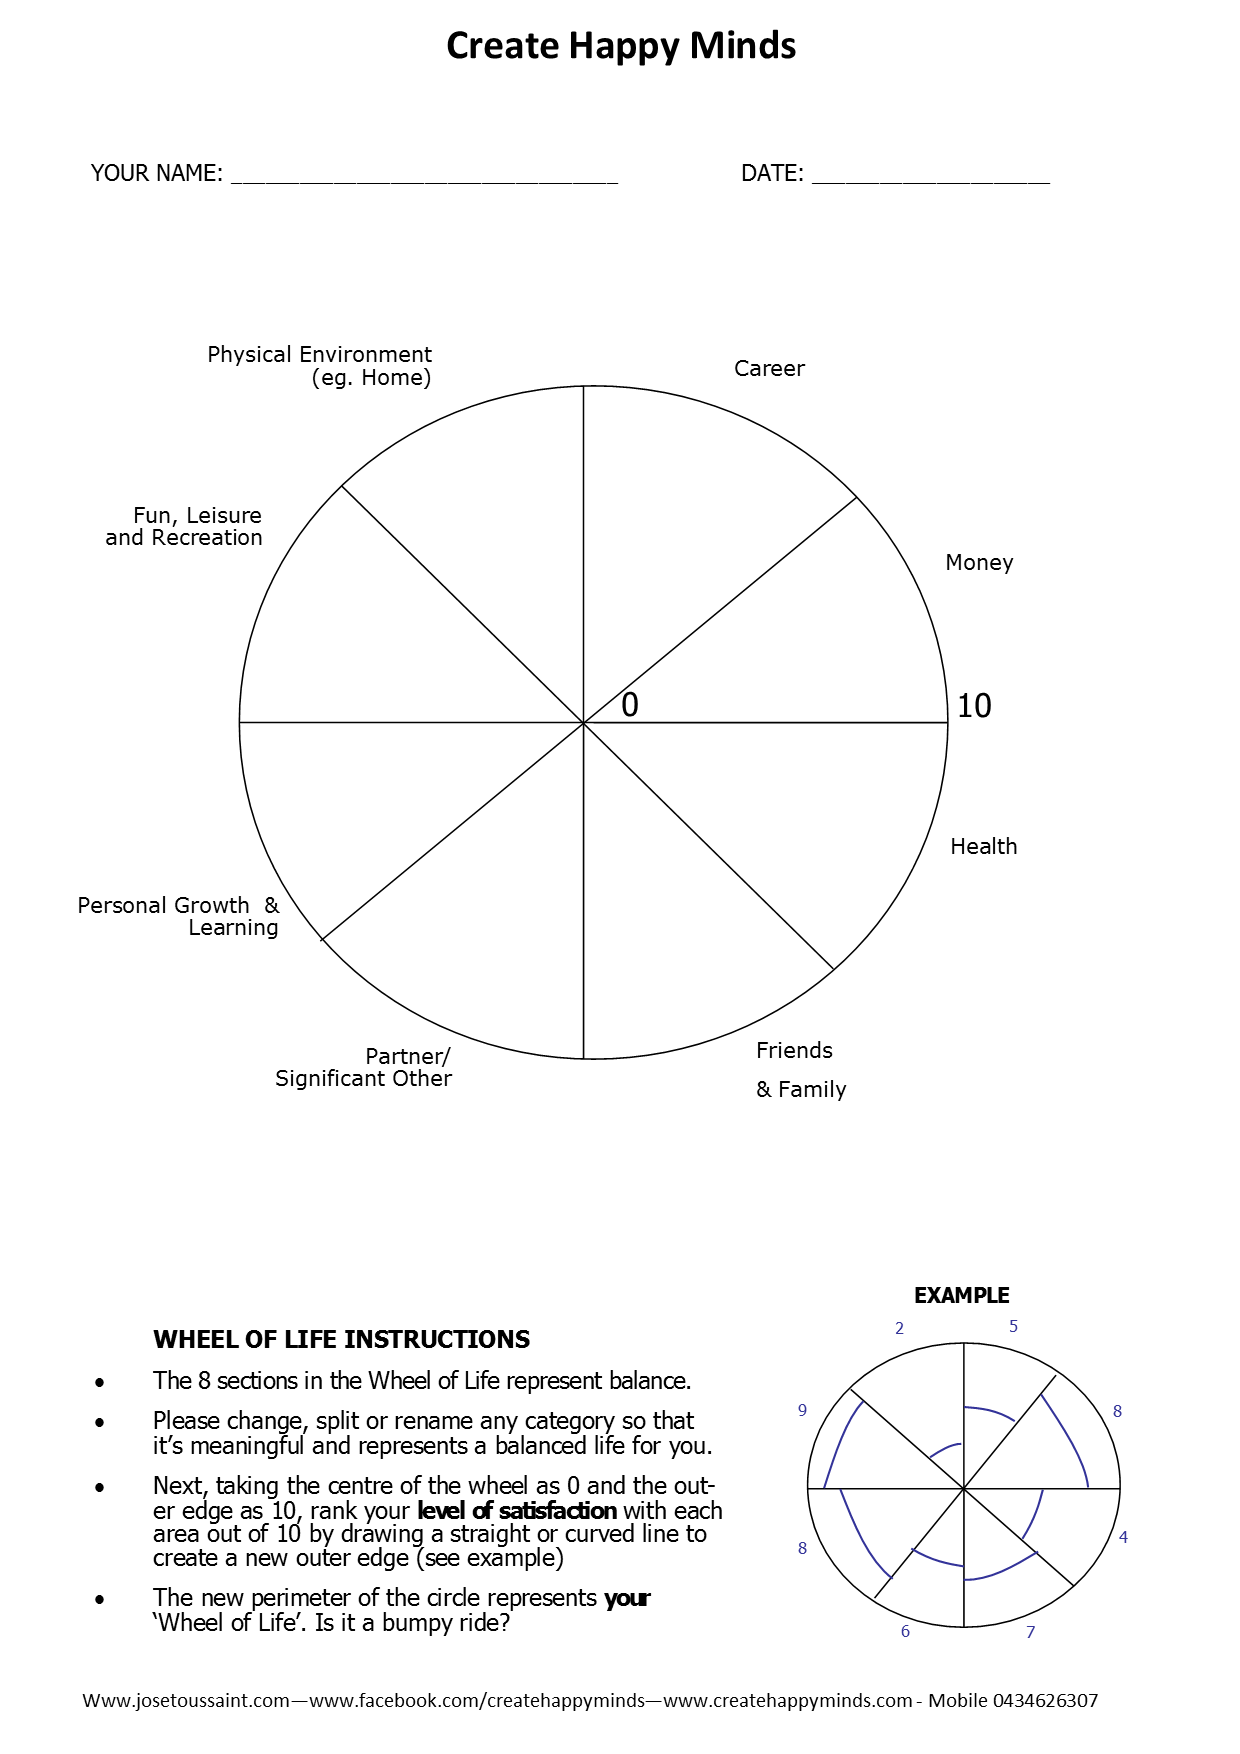 Wheel of life worksheet v2 create happy minds